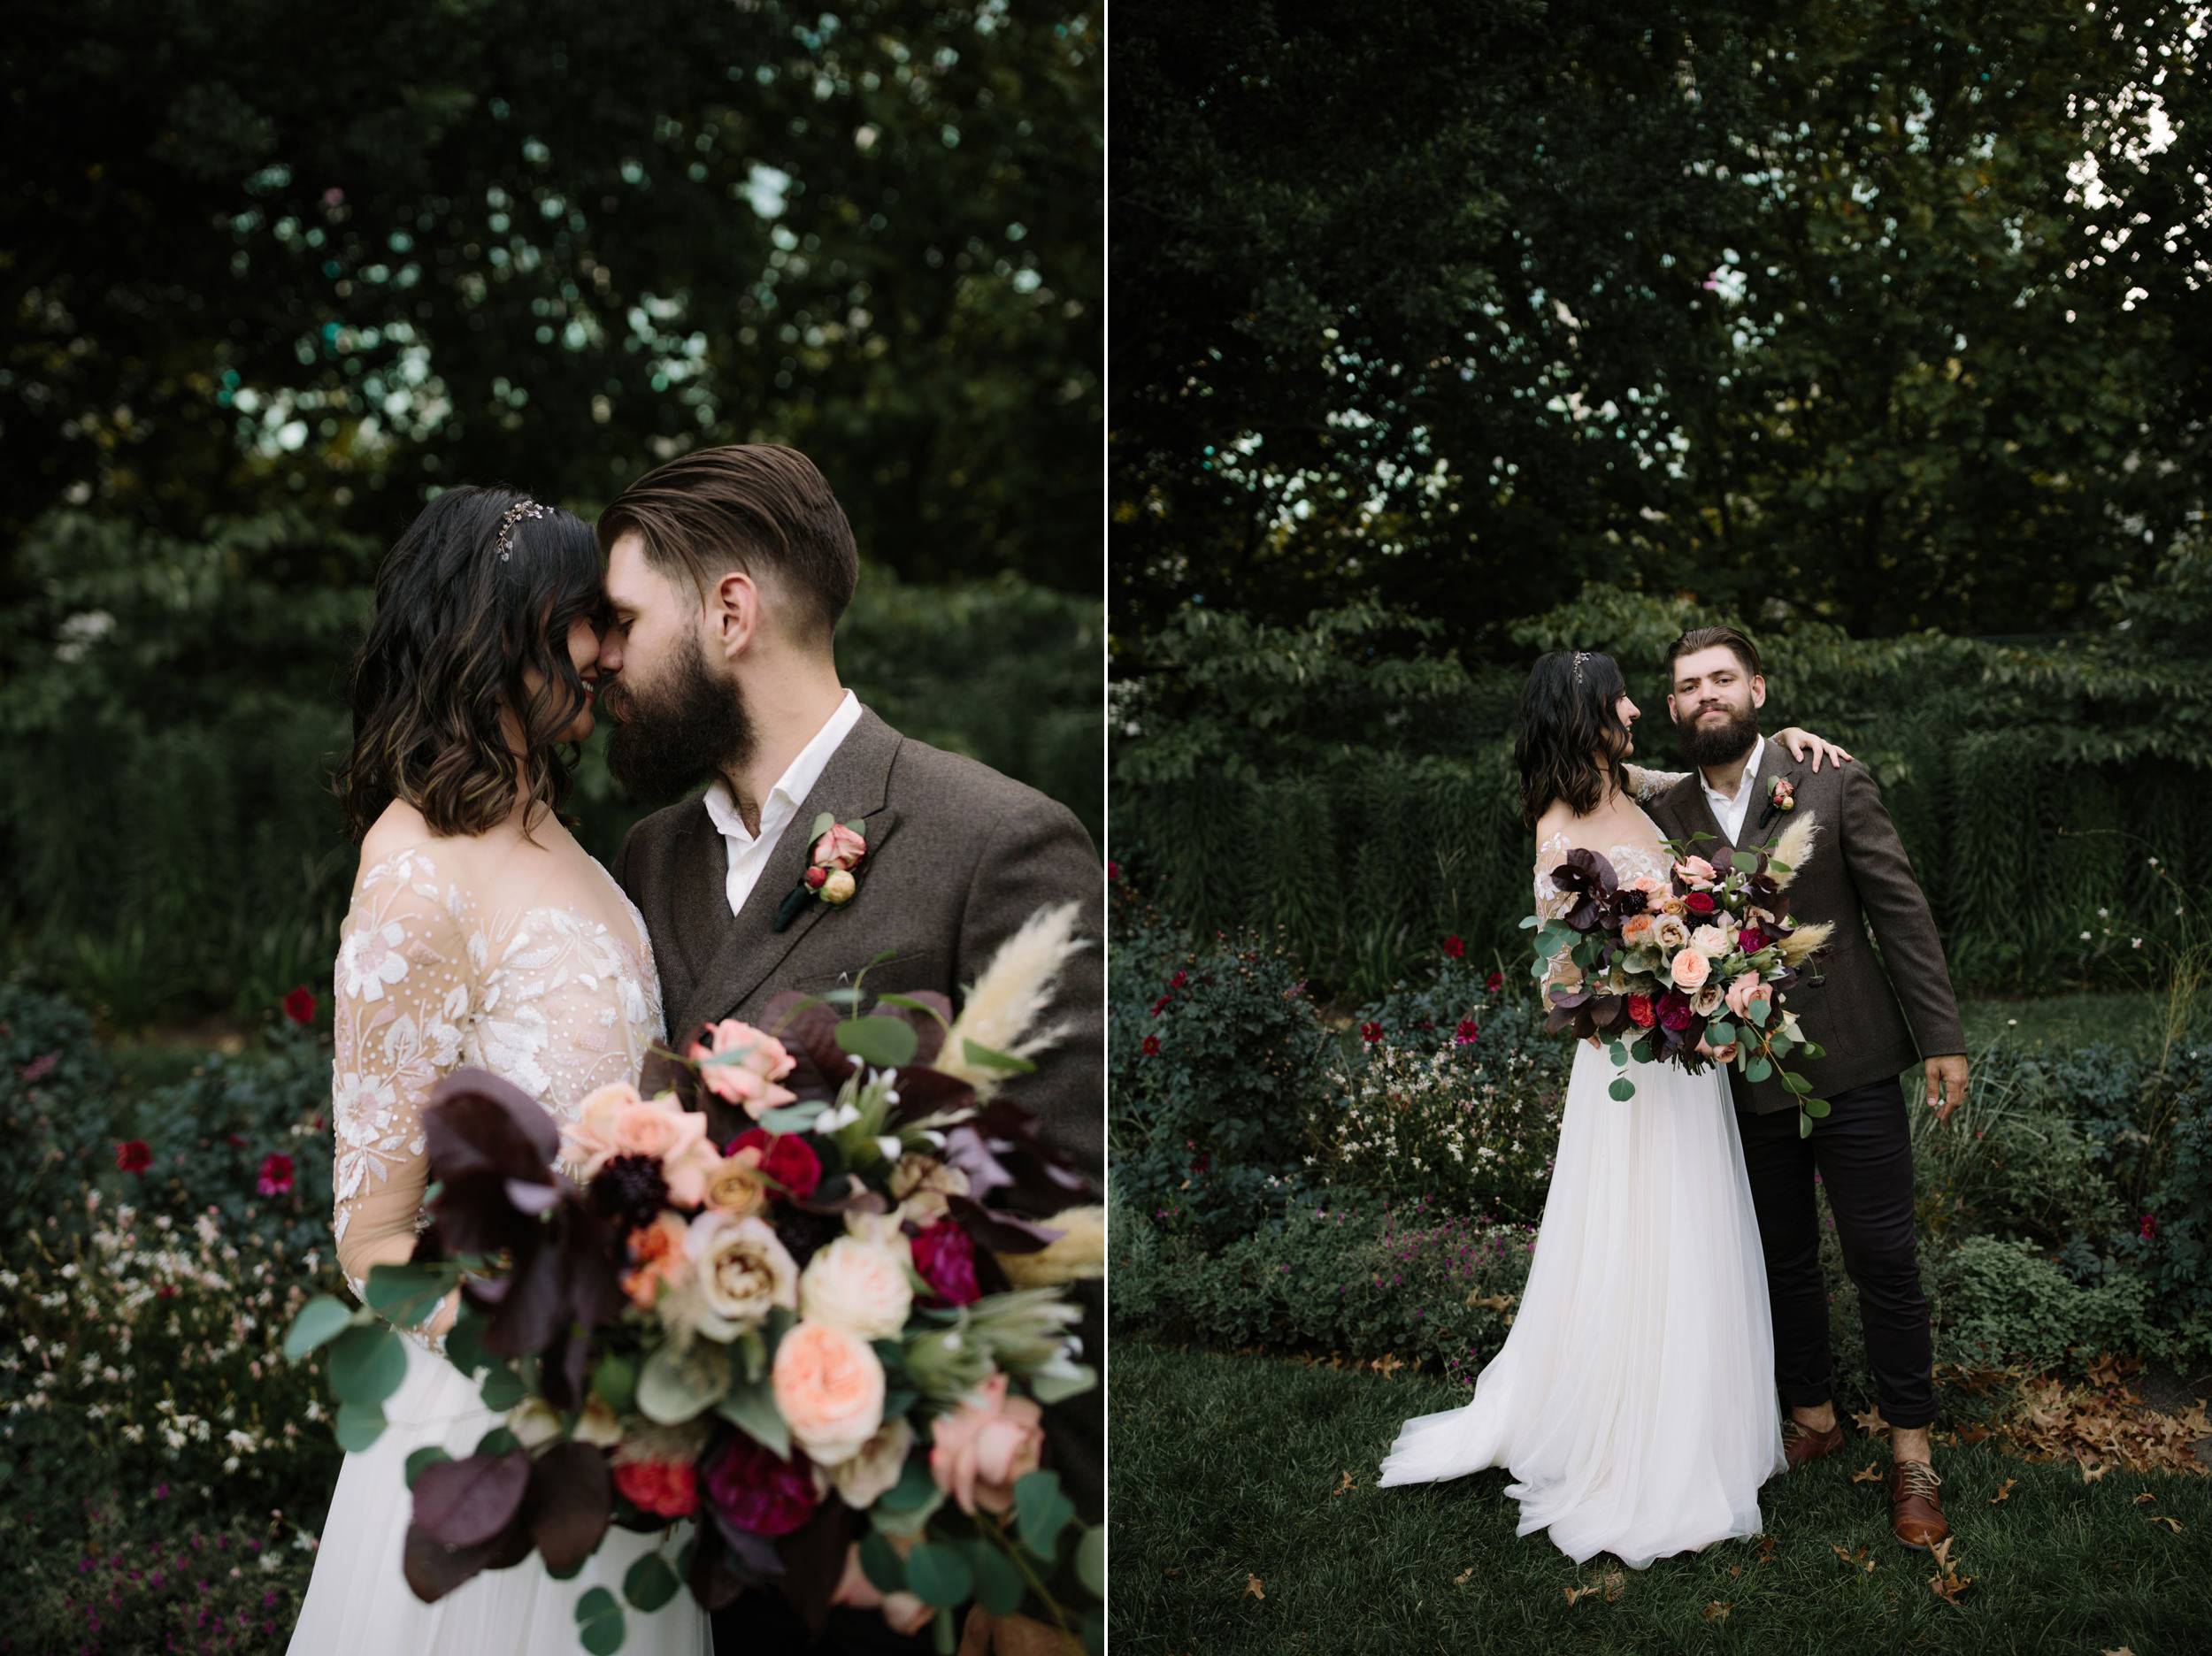 I-Got-You-Babe-Weddings-Hayley-Sam-NGV-Melbourne0078.JPG